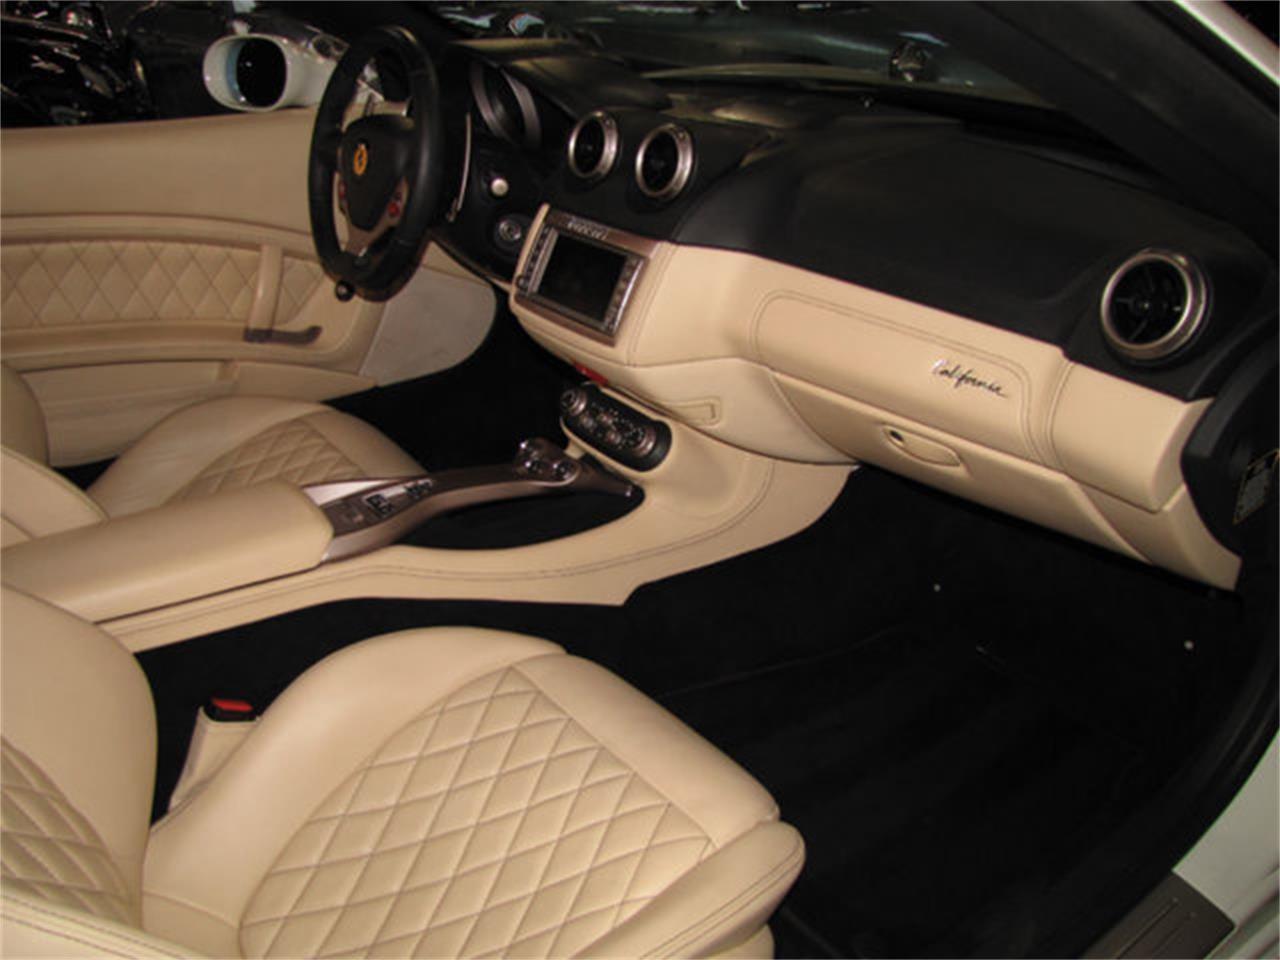 2014 Ferrari California (CC-1164462) for sale in Hollywood, California